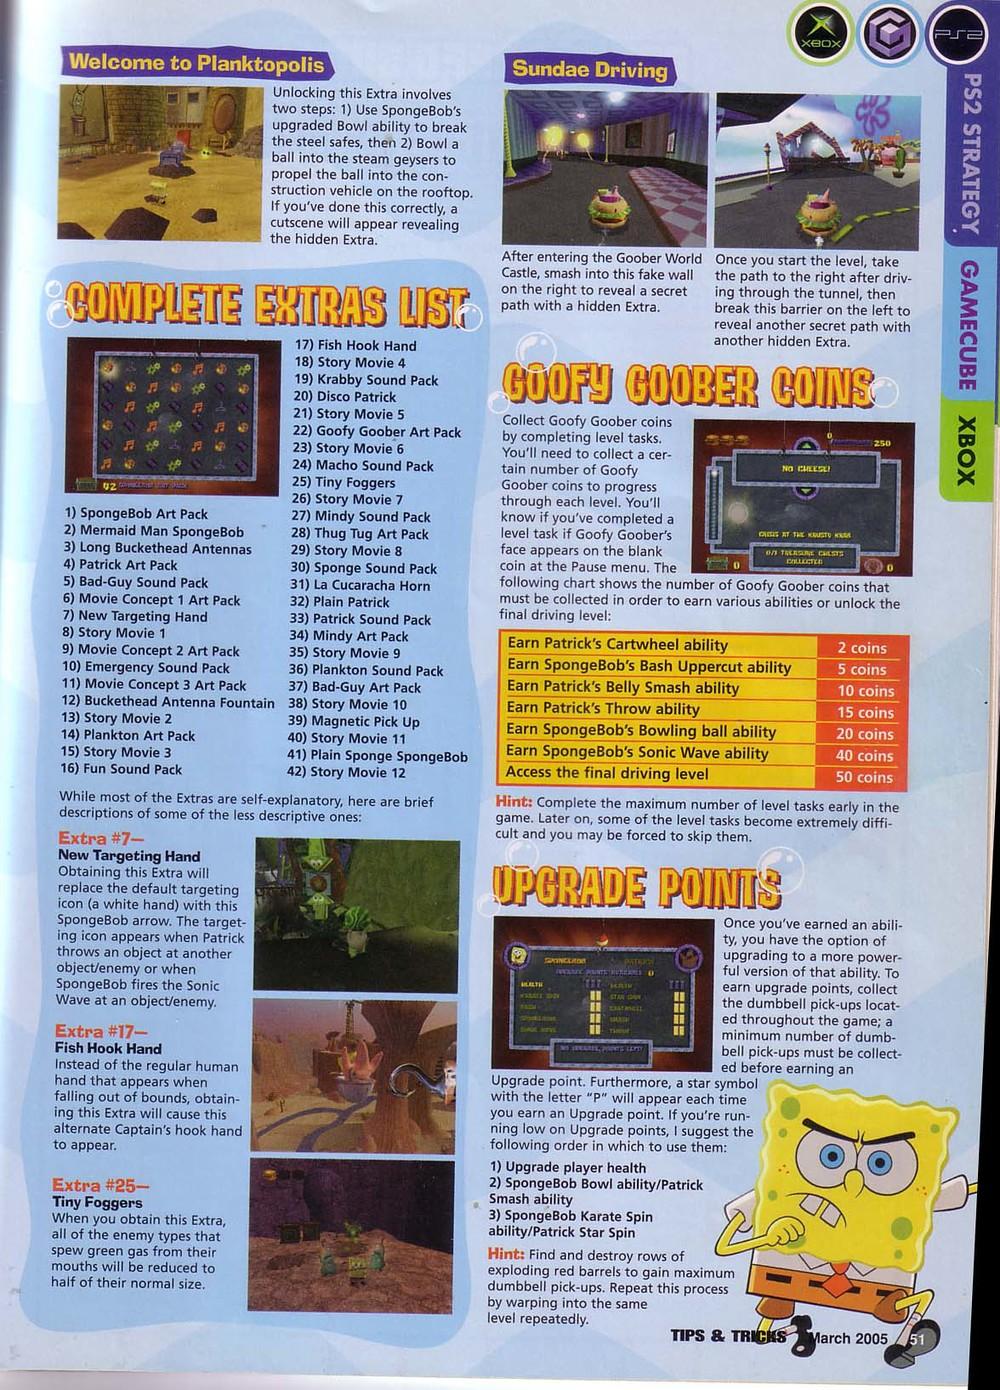 TipsandTricks_March_2005_SpongeBob_pg2_Strategy.jpg